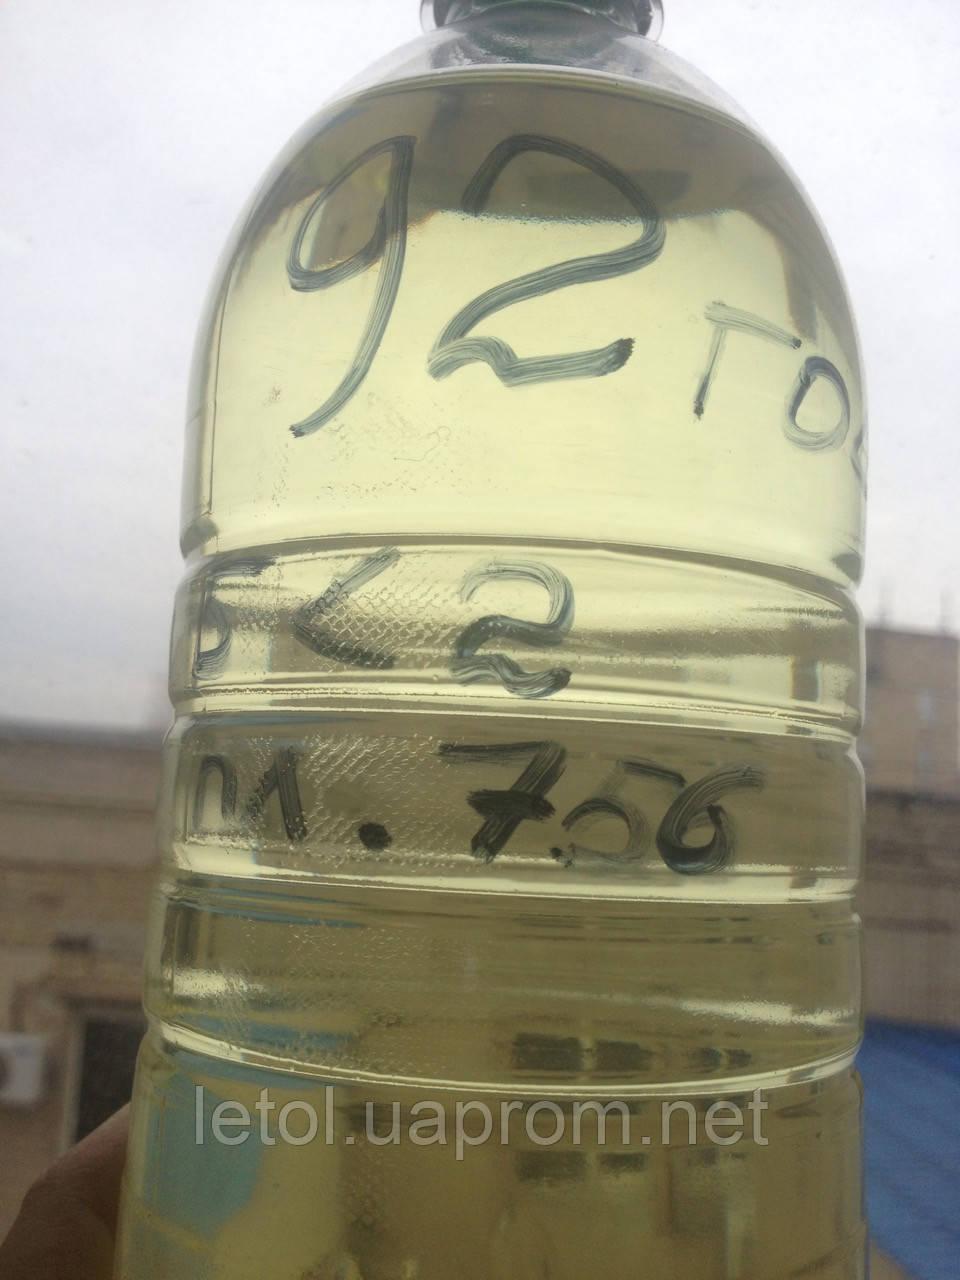 Бензин 92 и 95 (Украинский НПЗ)